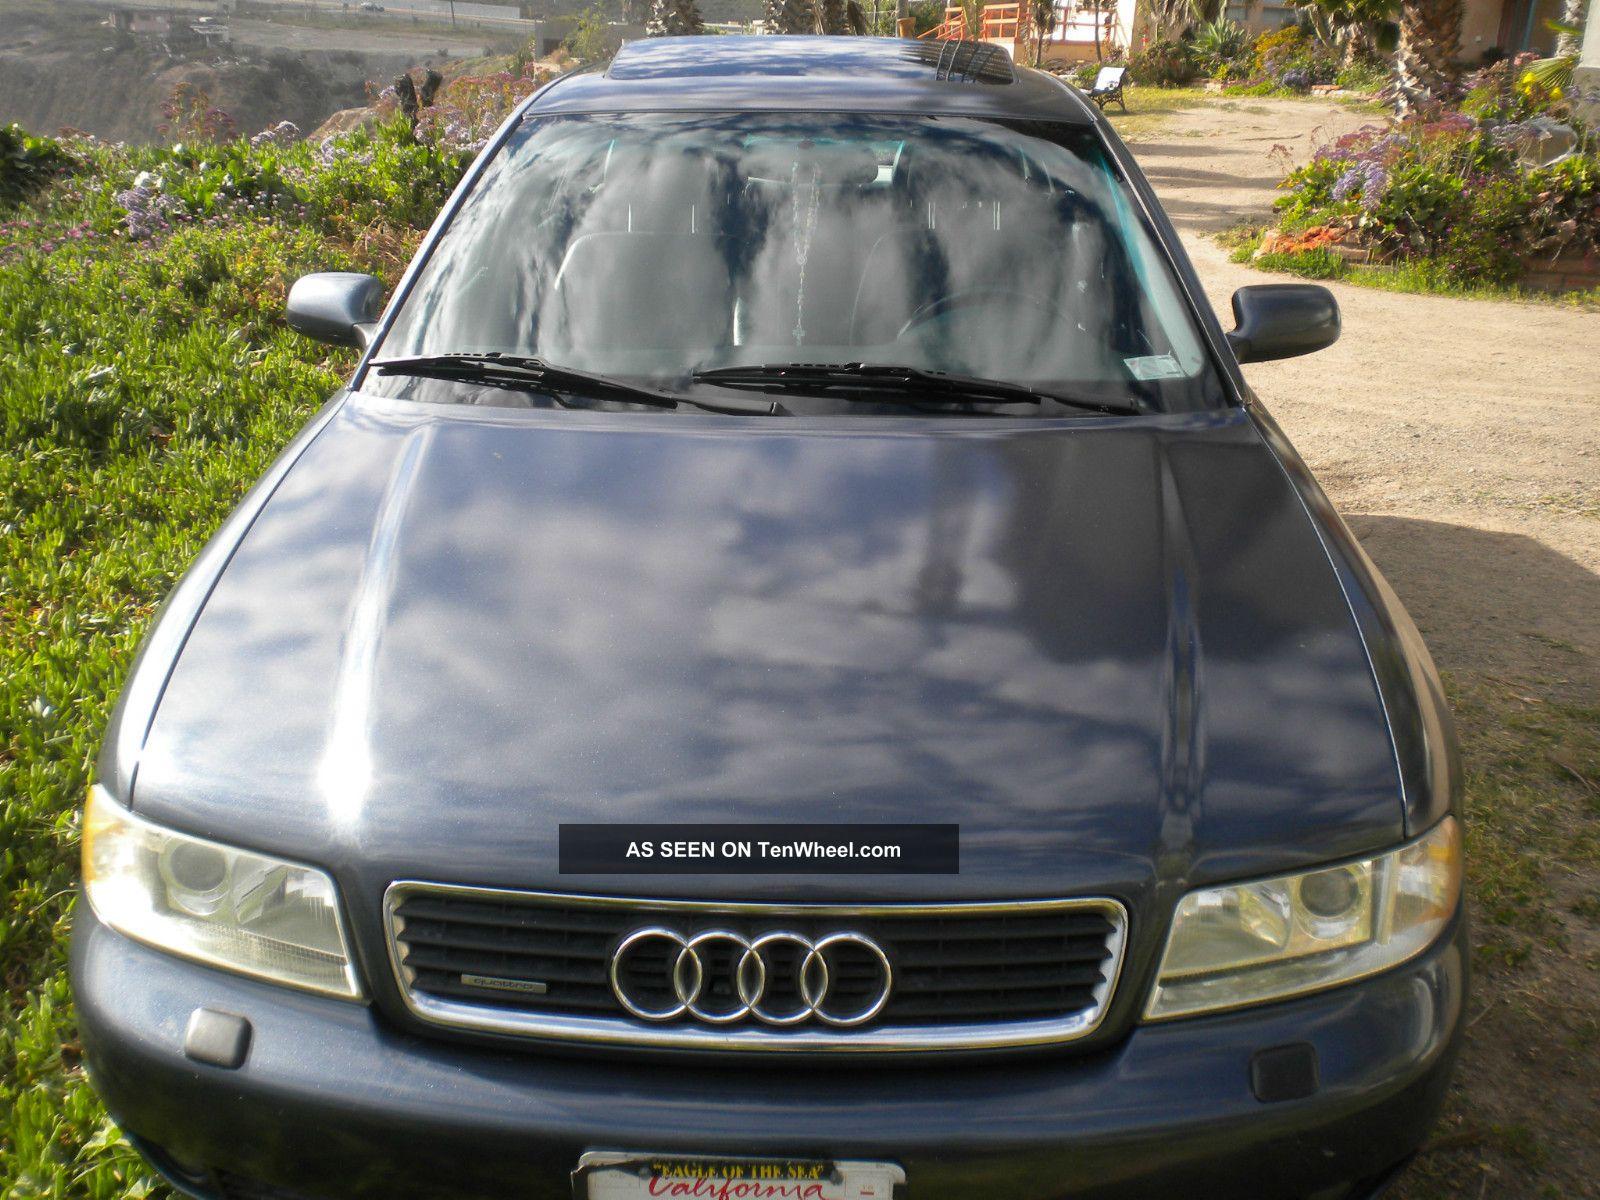 1999 Audi A4 Quattro 4x4 Title